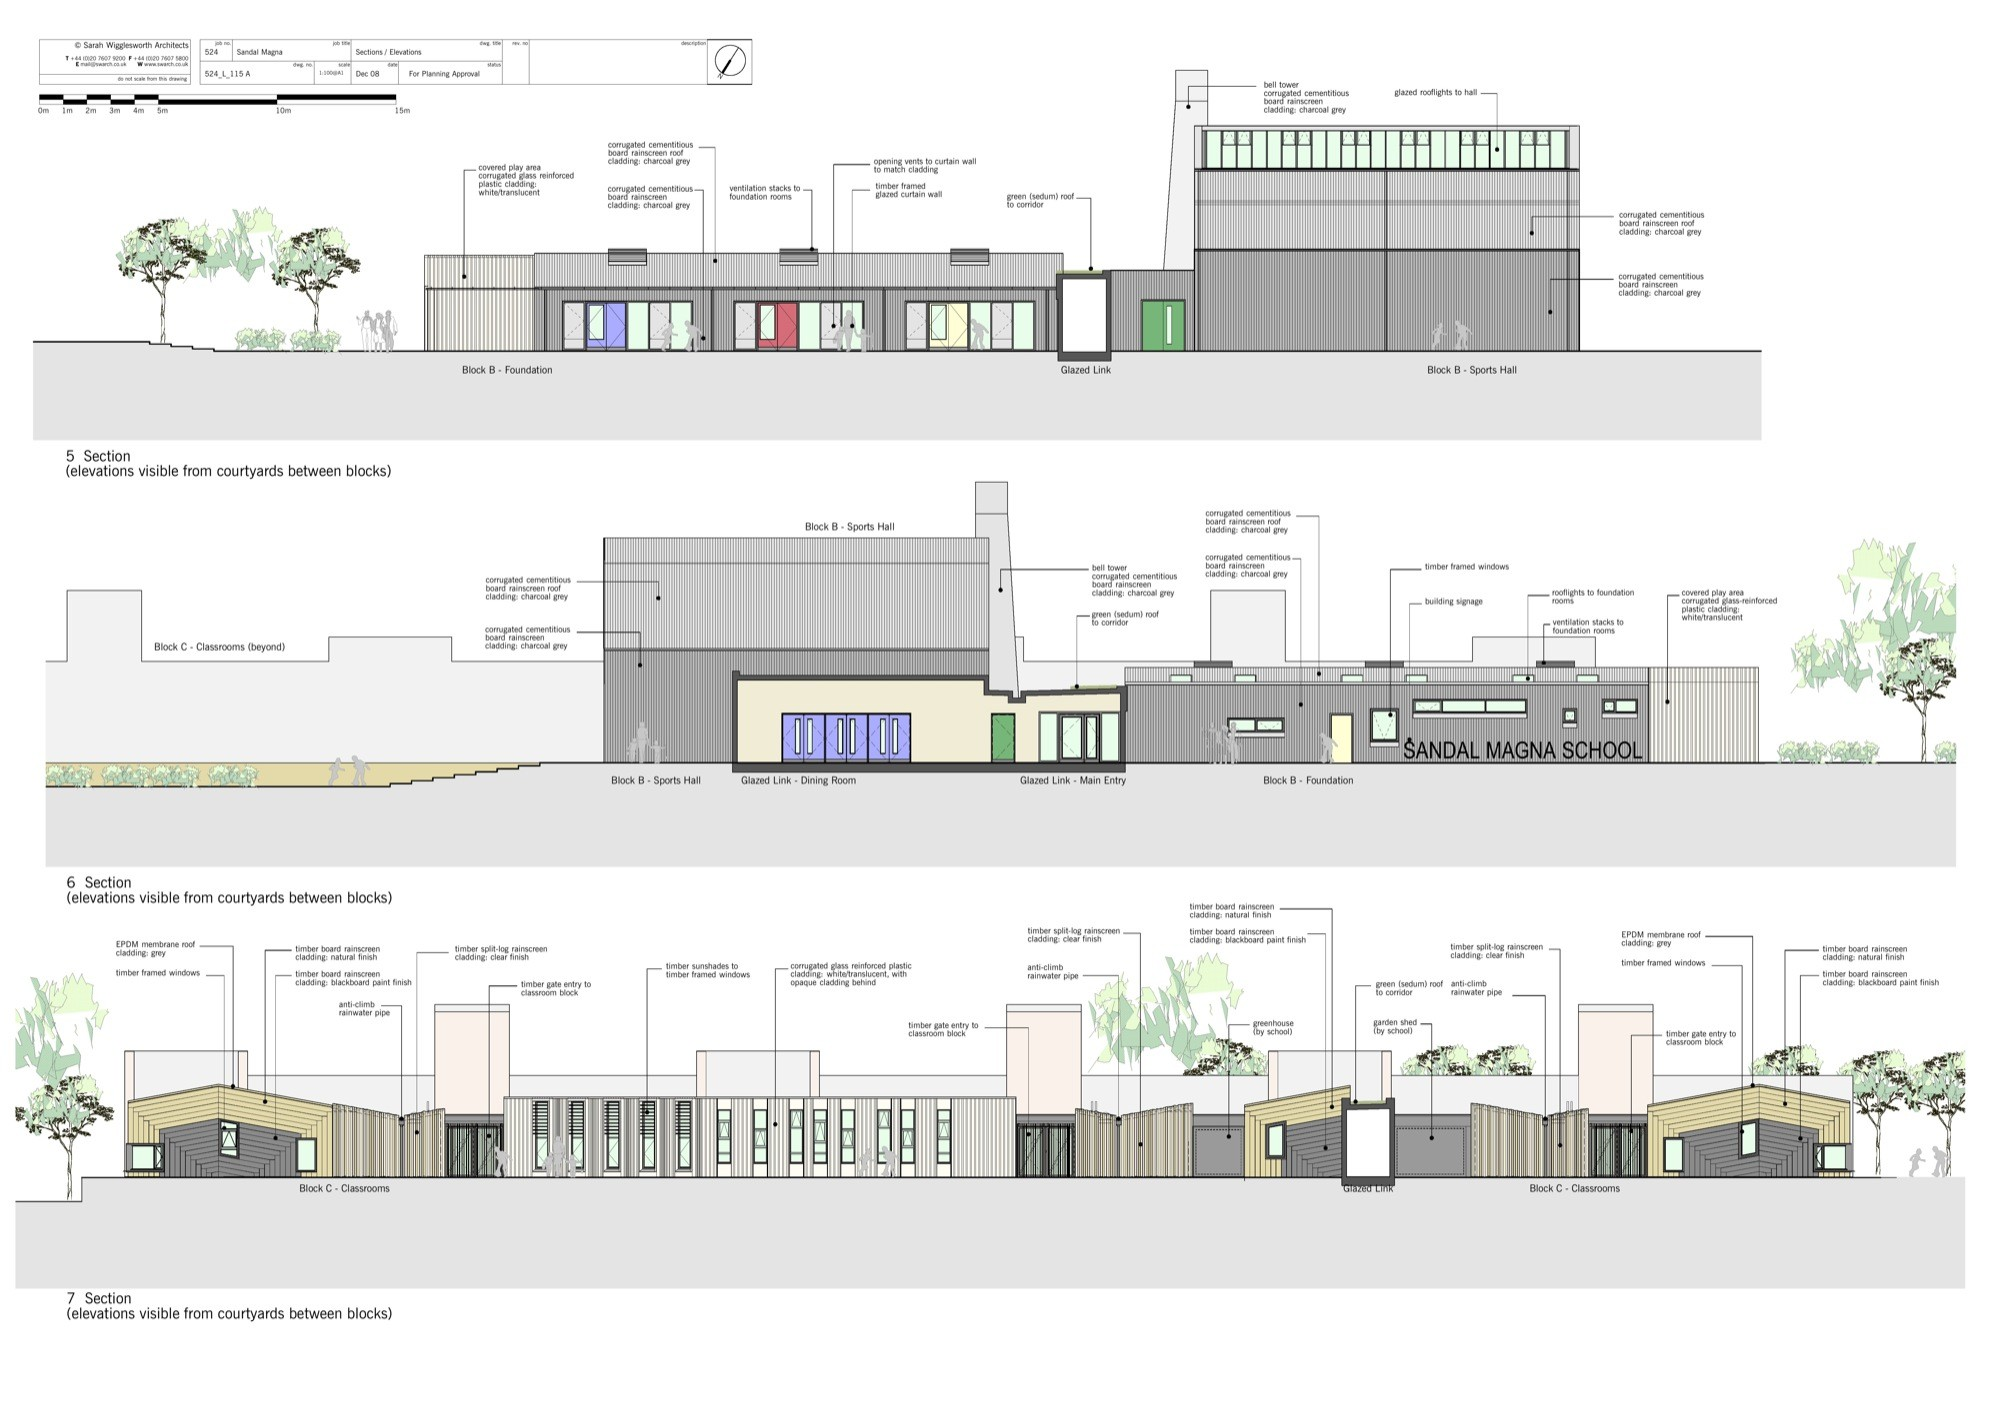 Primary School Plan Elevation : Gallery of sandal magna community primary school sarah